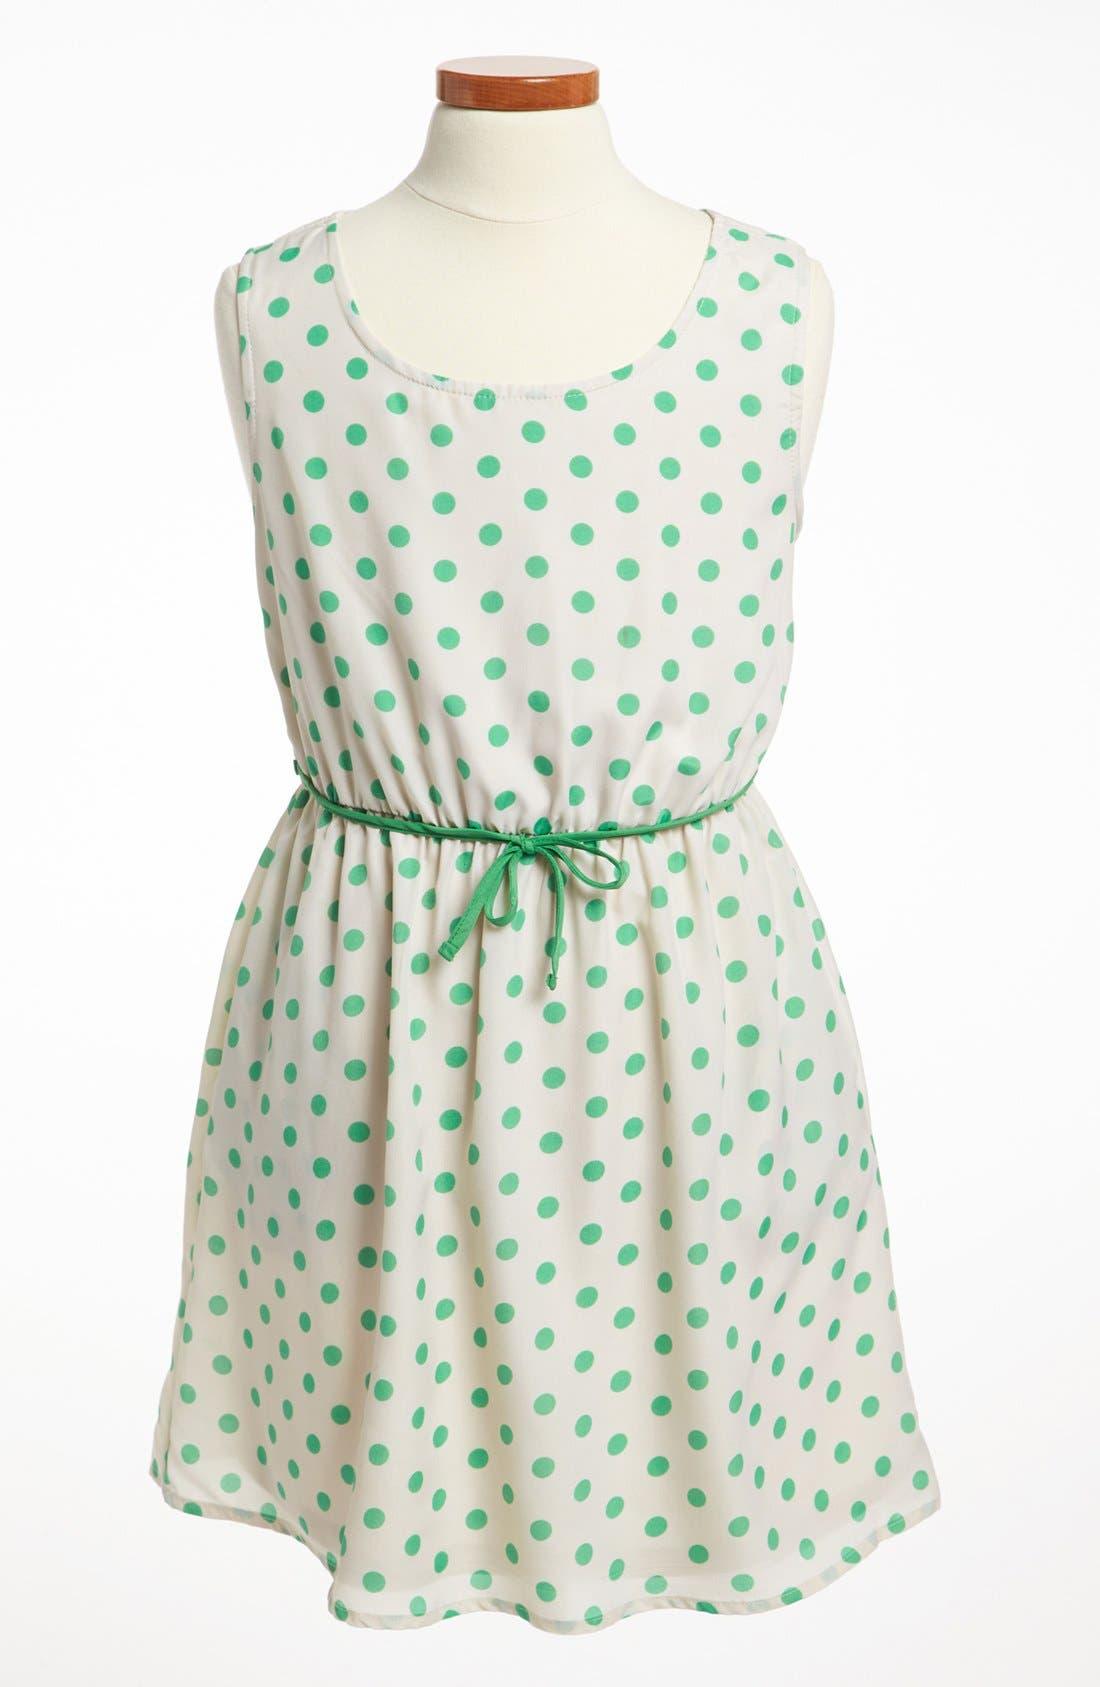 Alternate Image 1 Selected - Mia Chica Polka Dot Dress (Big Girls)